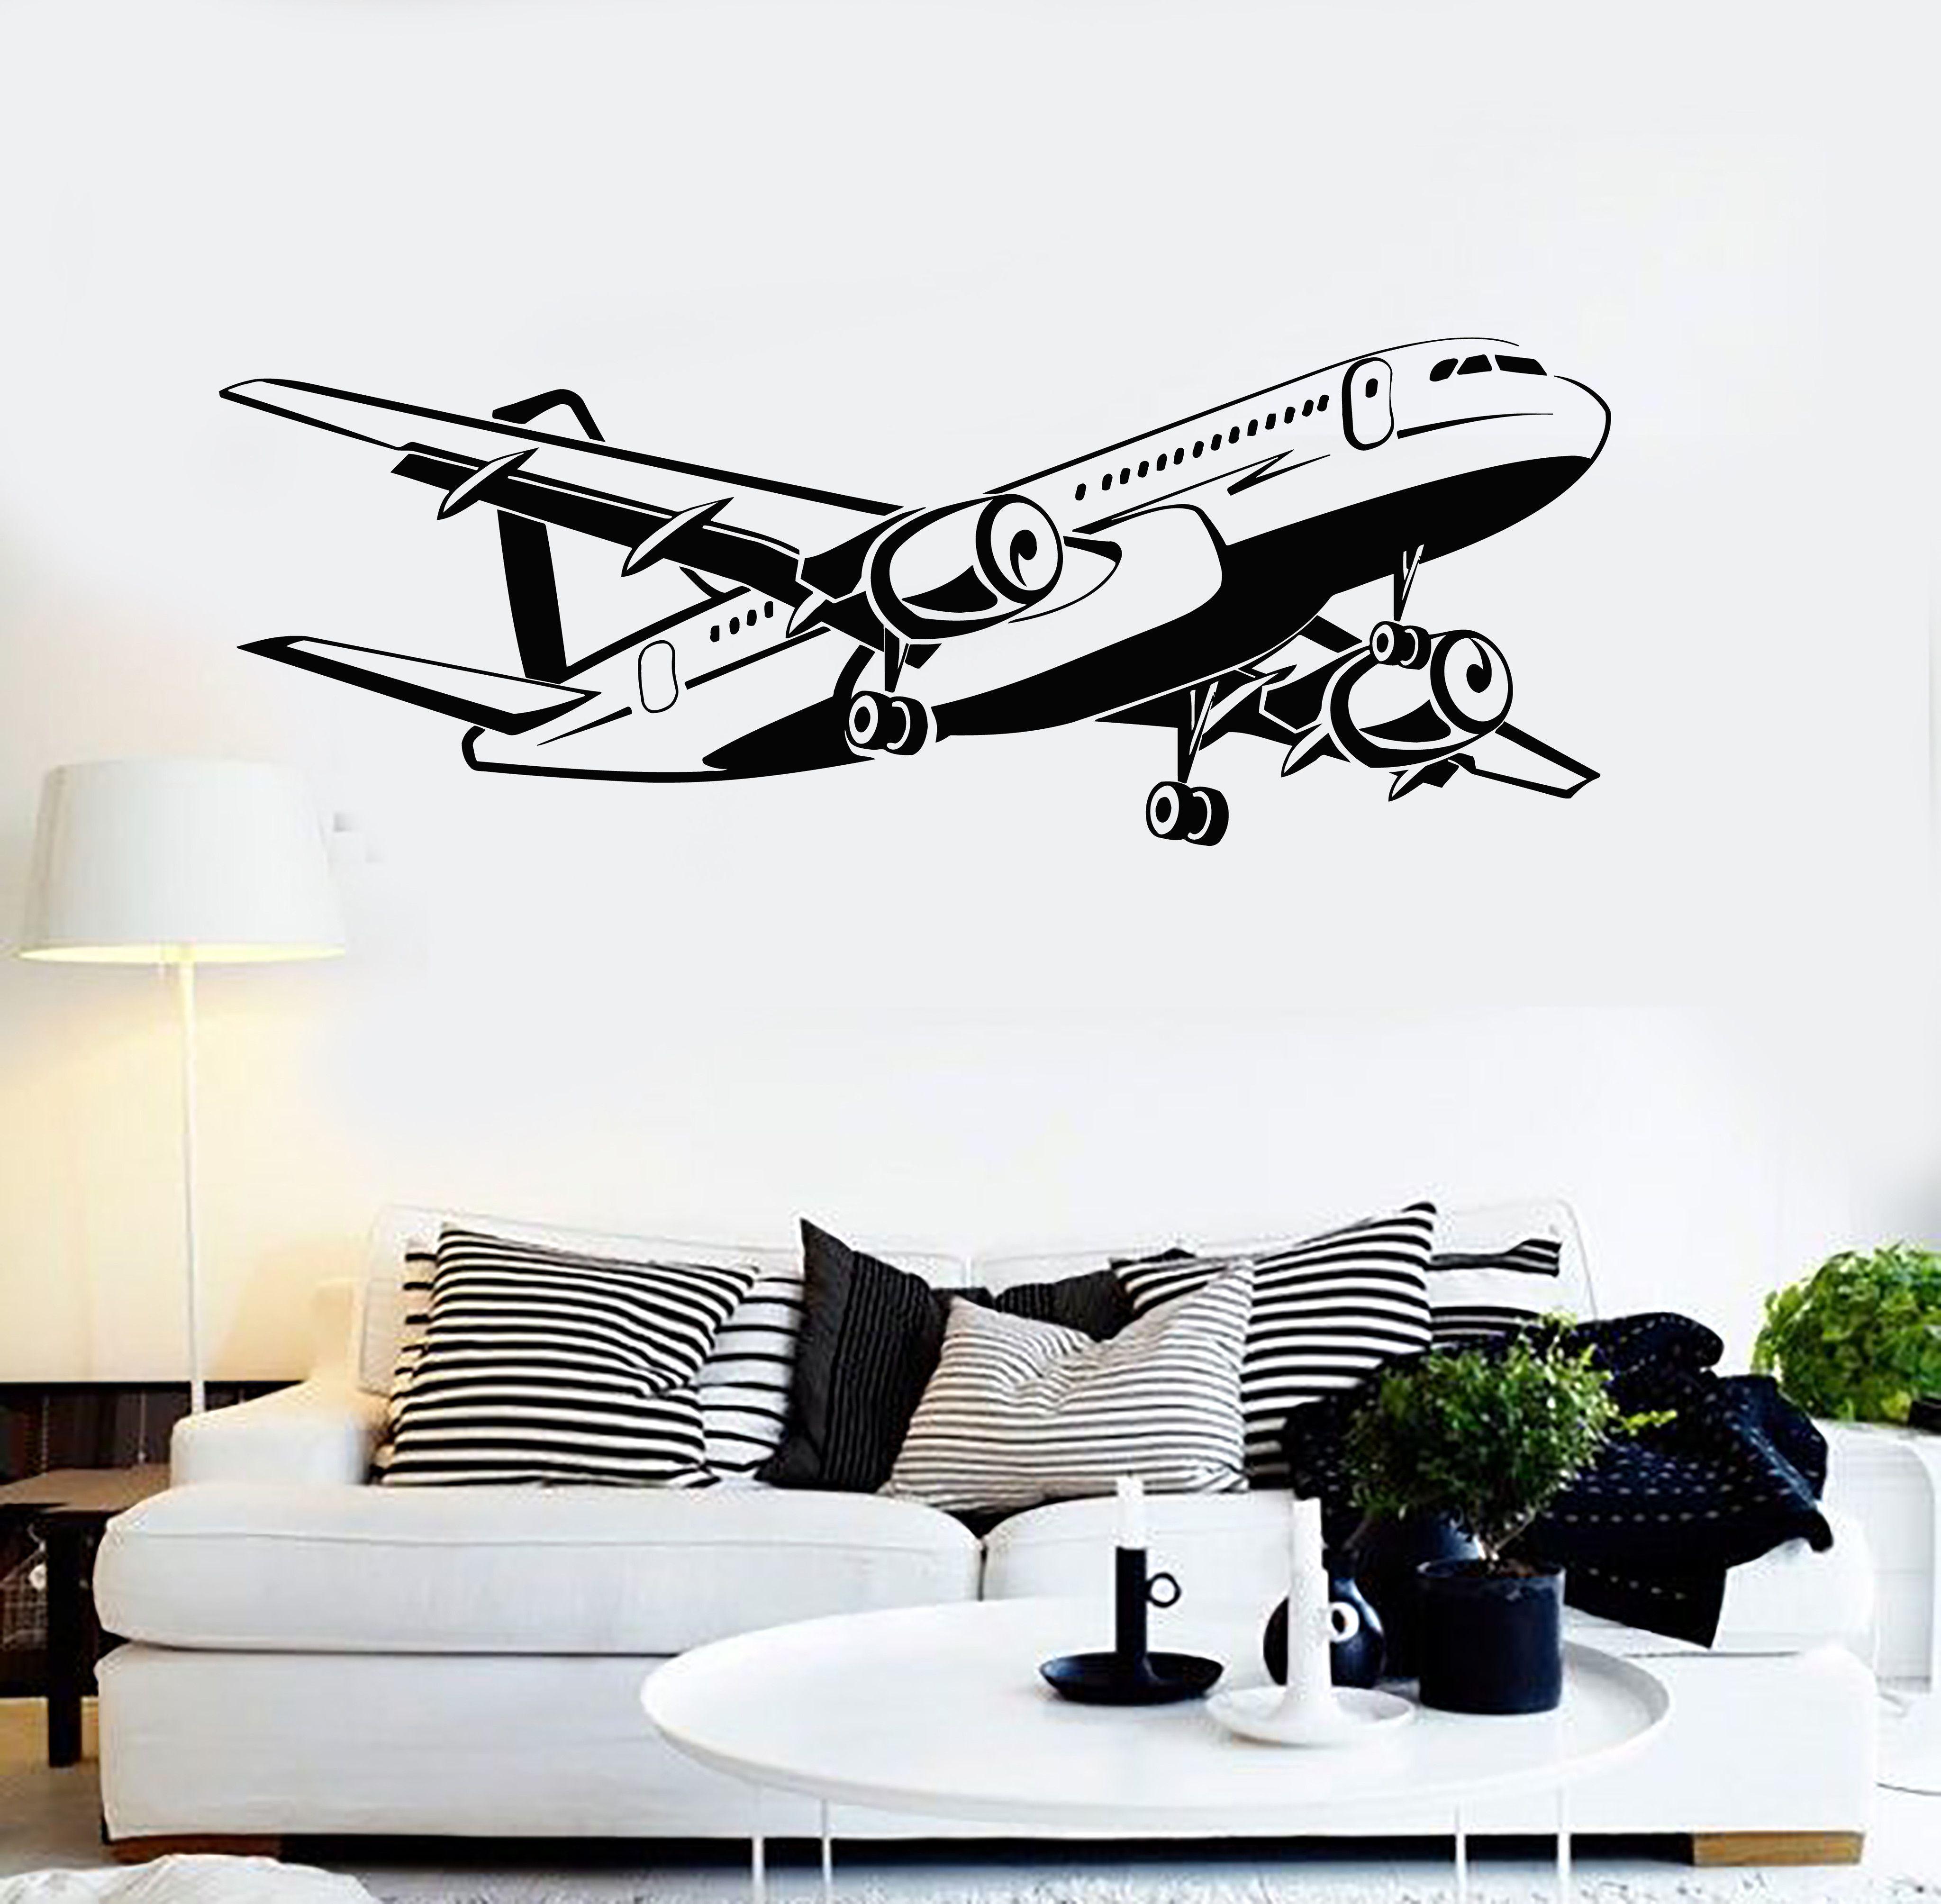 Vinyl Wall Decal Aircraft Airplane Aviation Art Decorating Stickers Mural Ig5015 Aviationideas Airplane Decor Airplane Wall Art Aviation Decor [ 4018 x 4096 Pixel ]